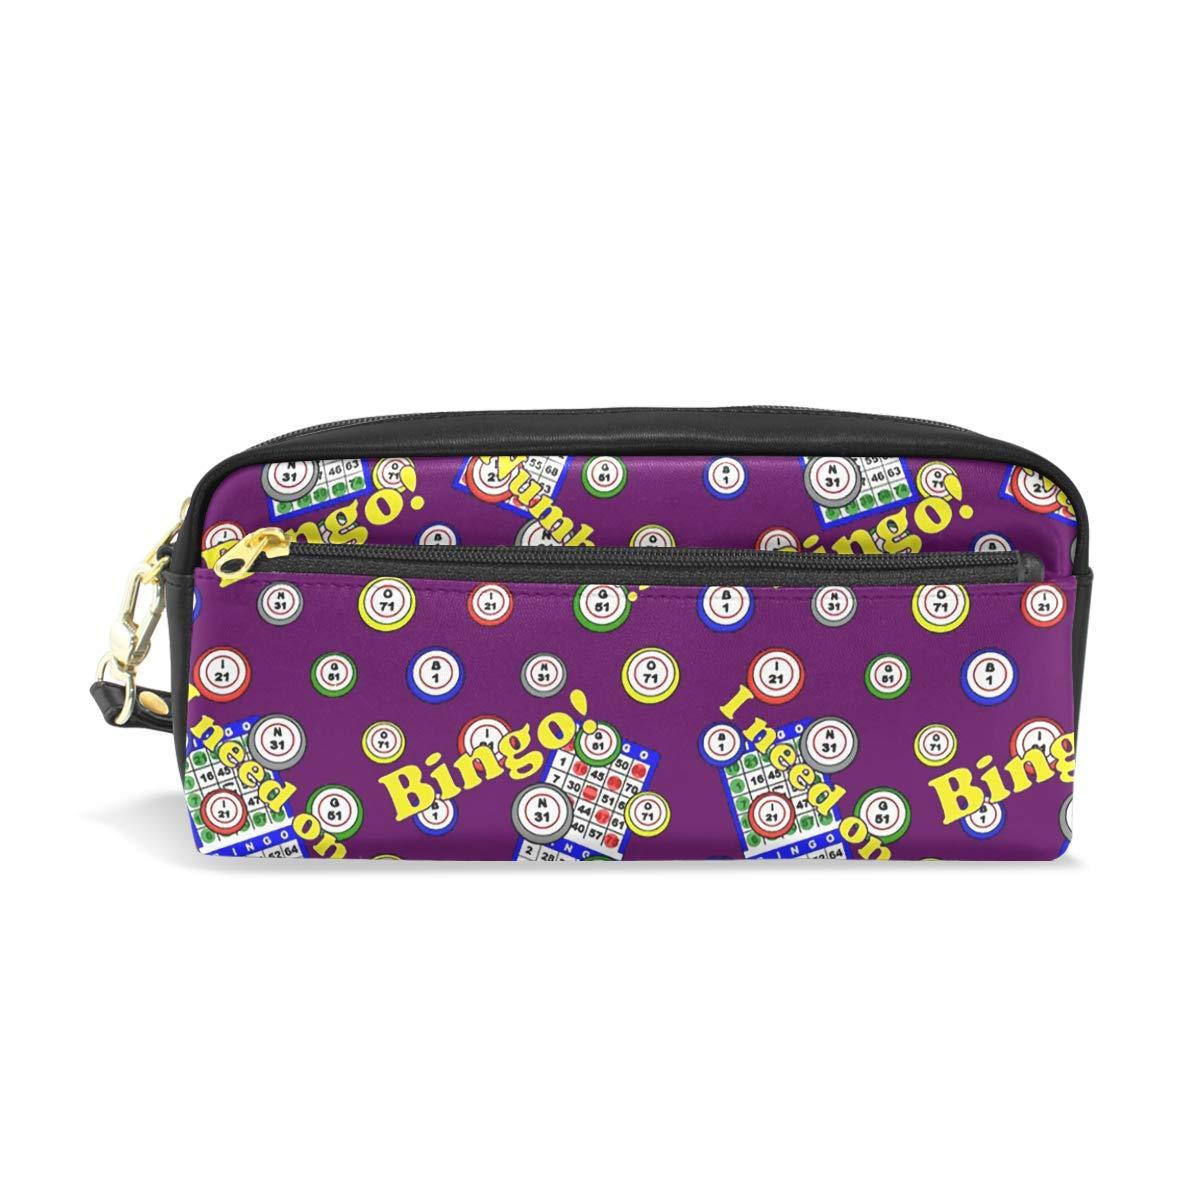 PU Leather Staroklaho Bingo Pen Pencil Case Bag Purse Pouch Cosmetic Bag Zipper for School Boy Girl Office Work by AngSing